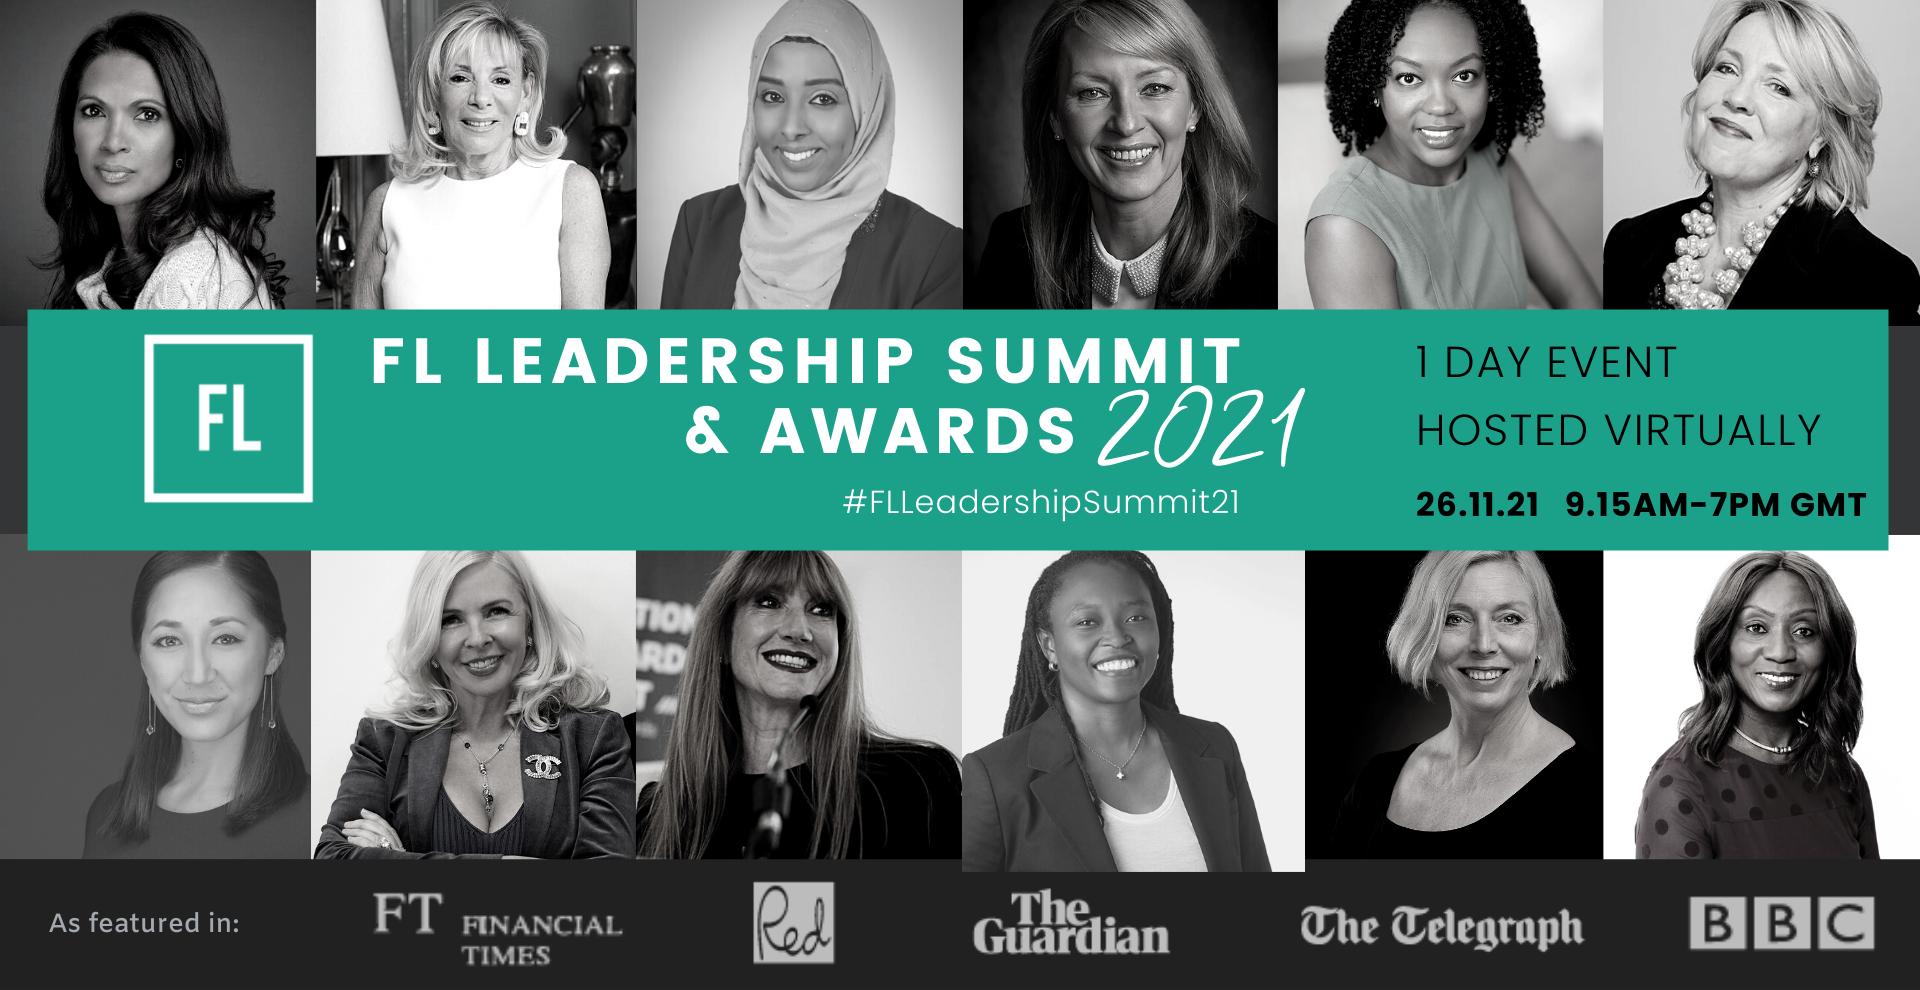 FL Leadership Summit & Awards 2021